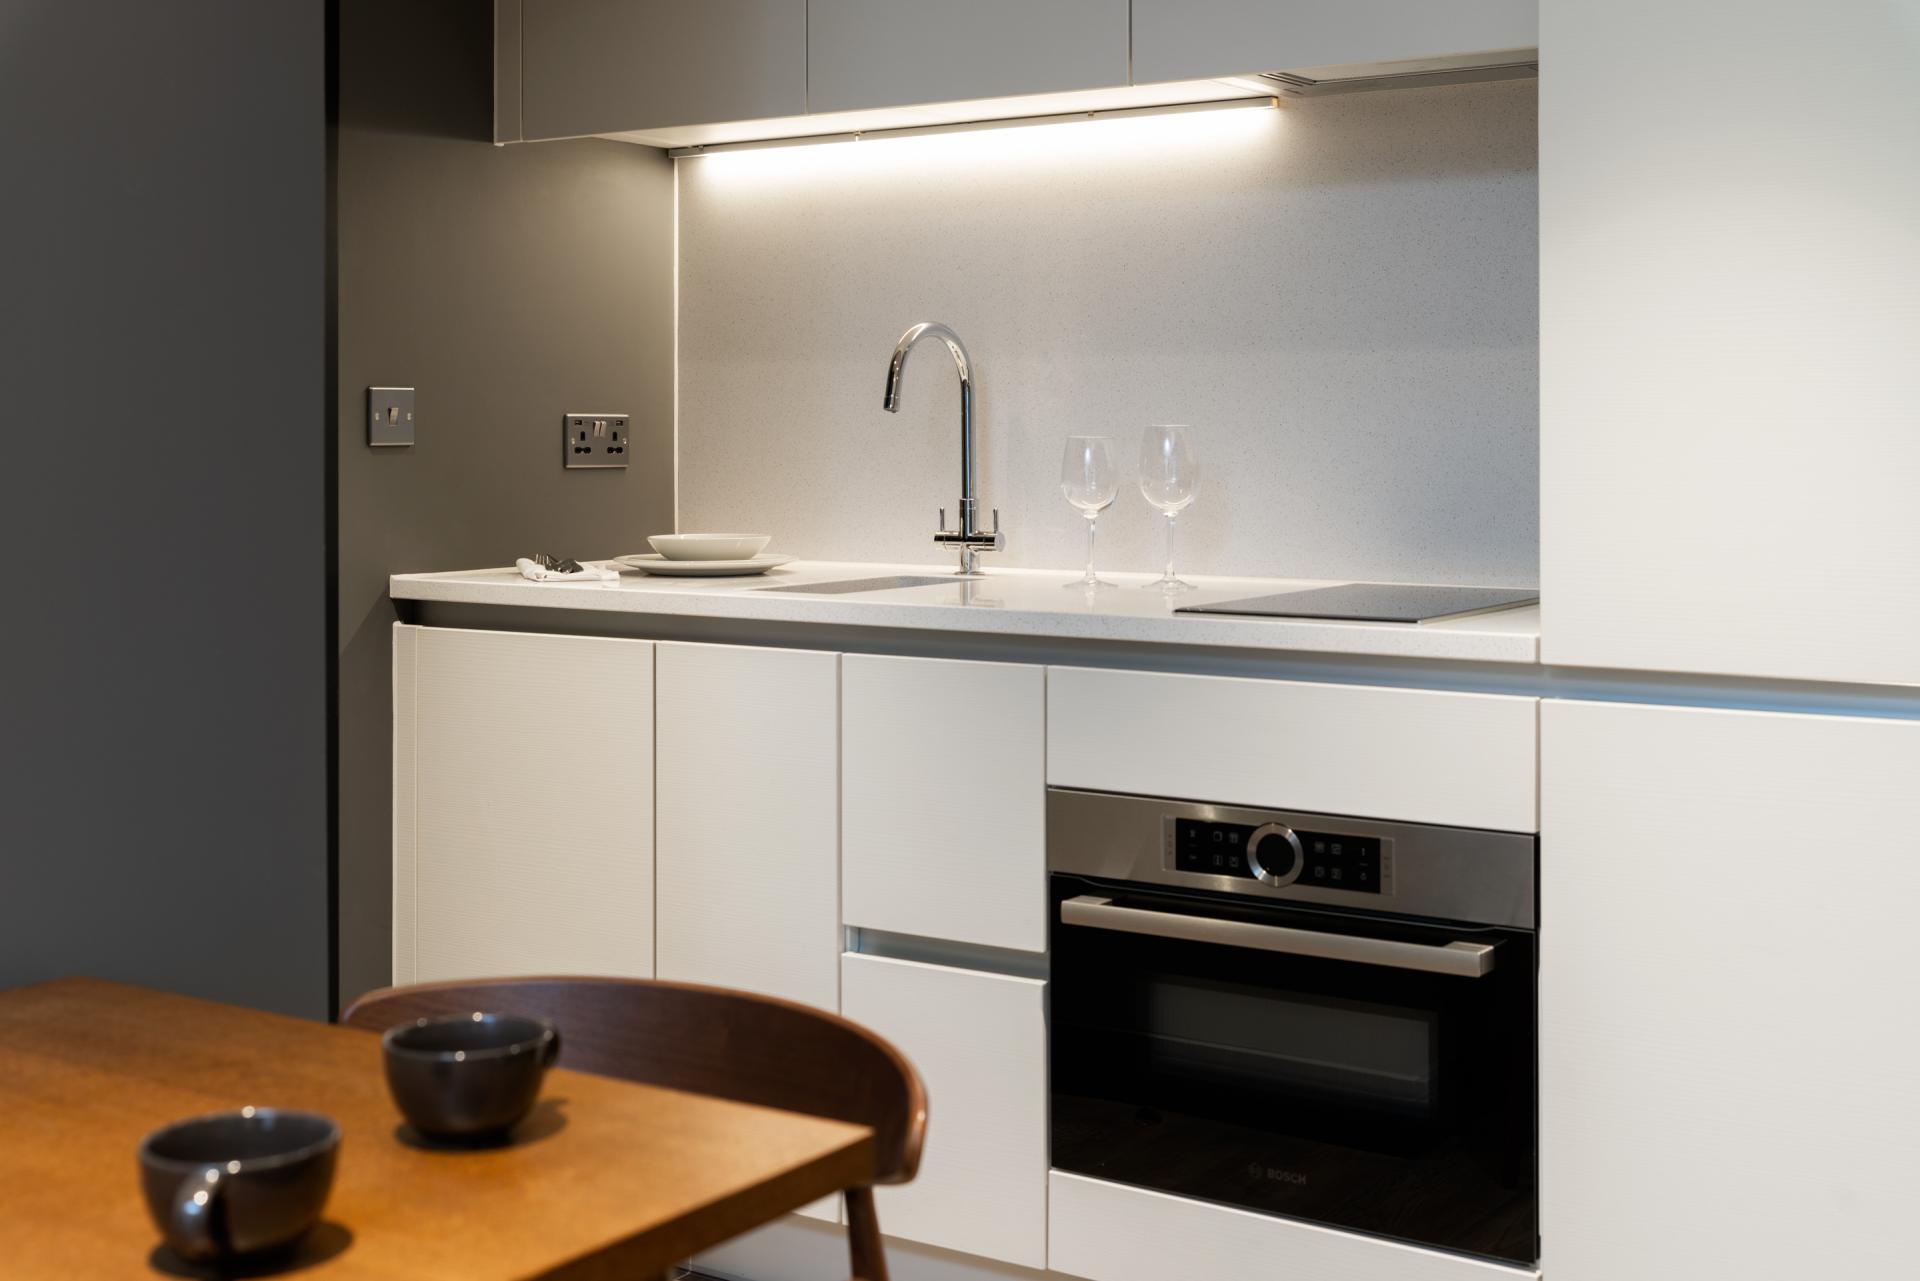 Kitchen at The Gate Apartments, Whitechapel, London - Citybase Apartments